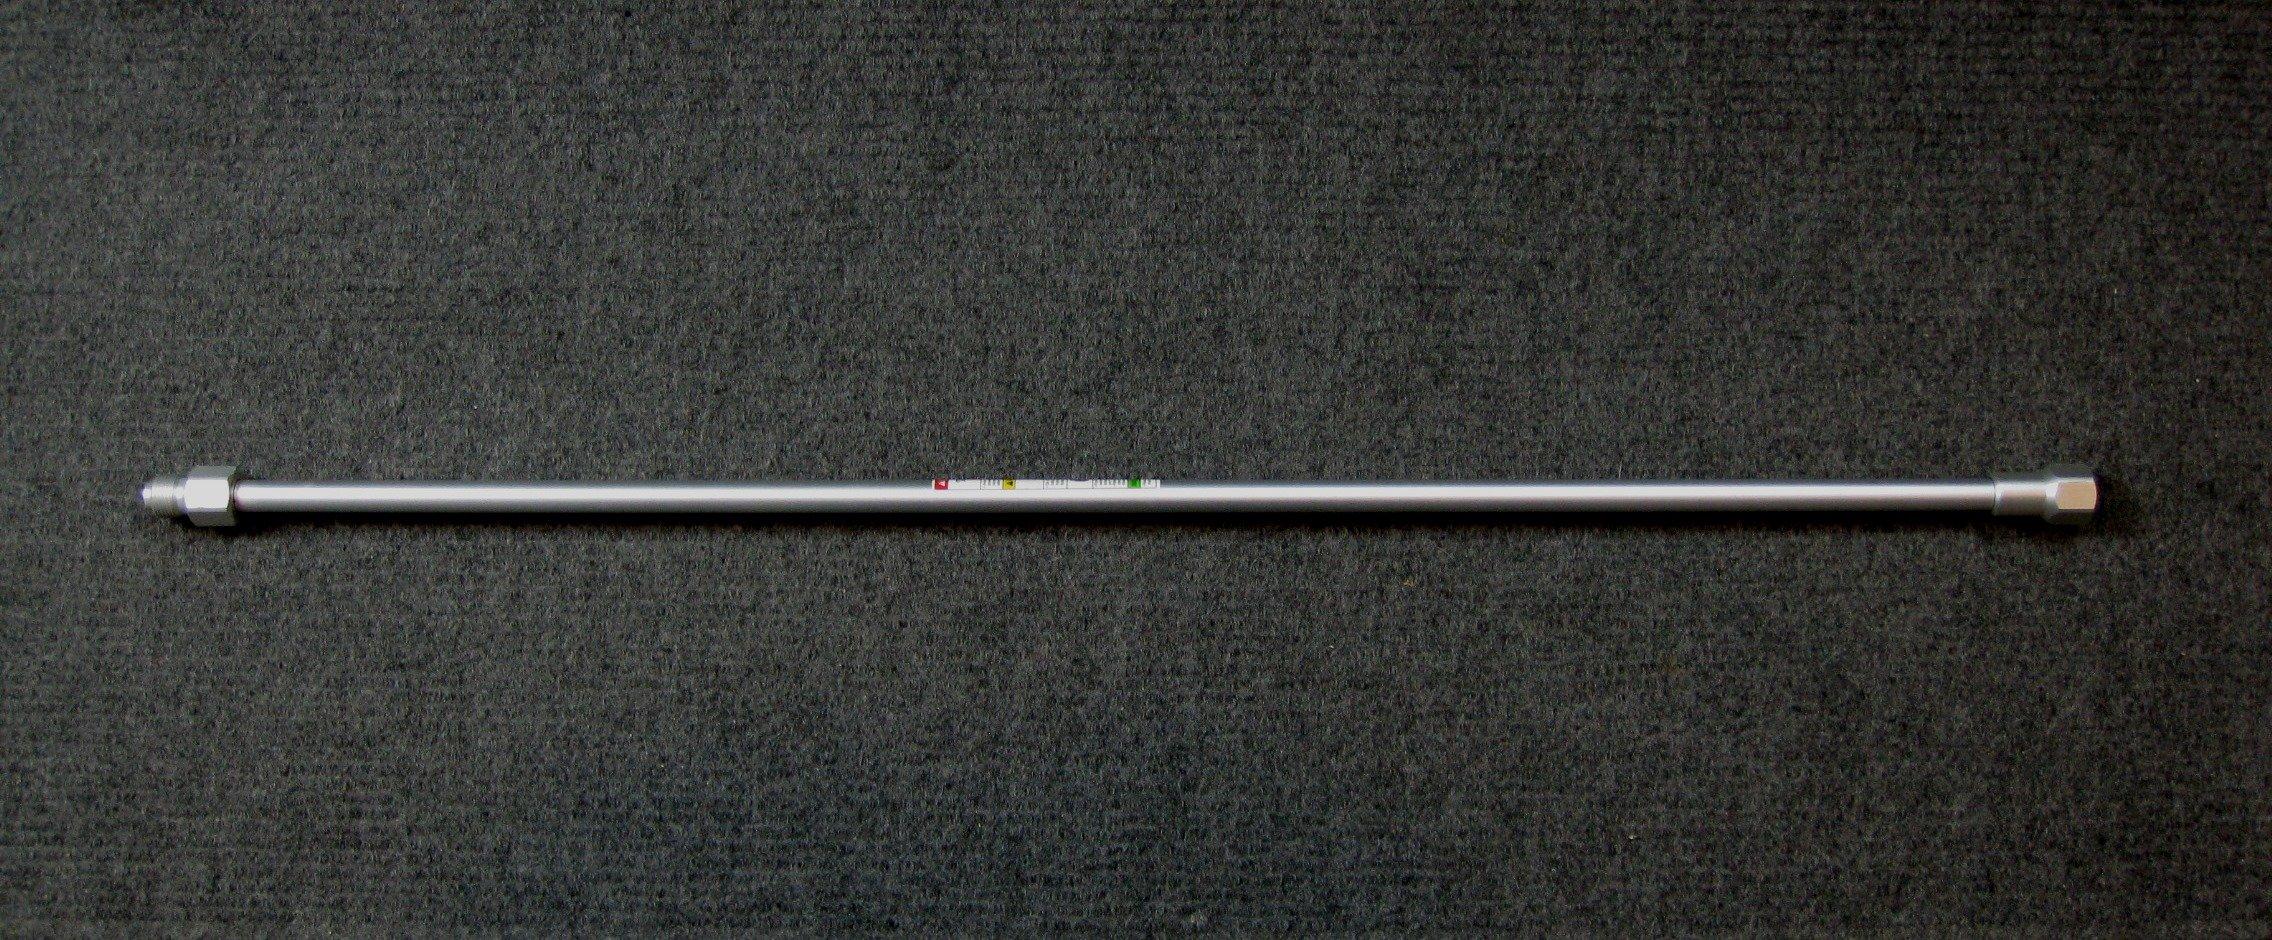 3' Tip Extension - Airless Gun Extension Titan OEM 310-383-1 by TITAN